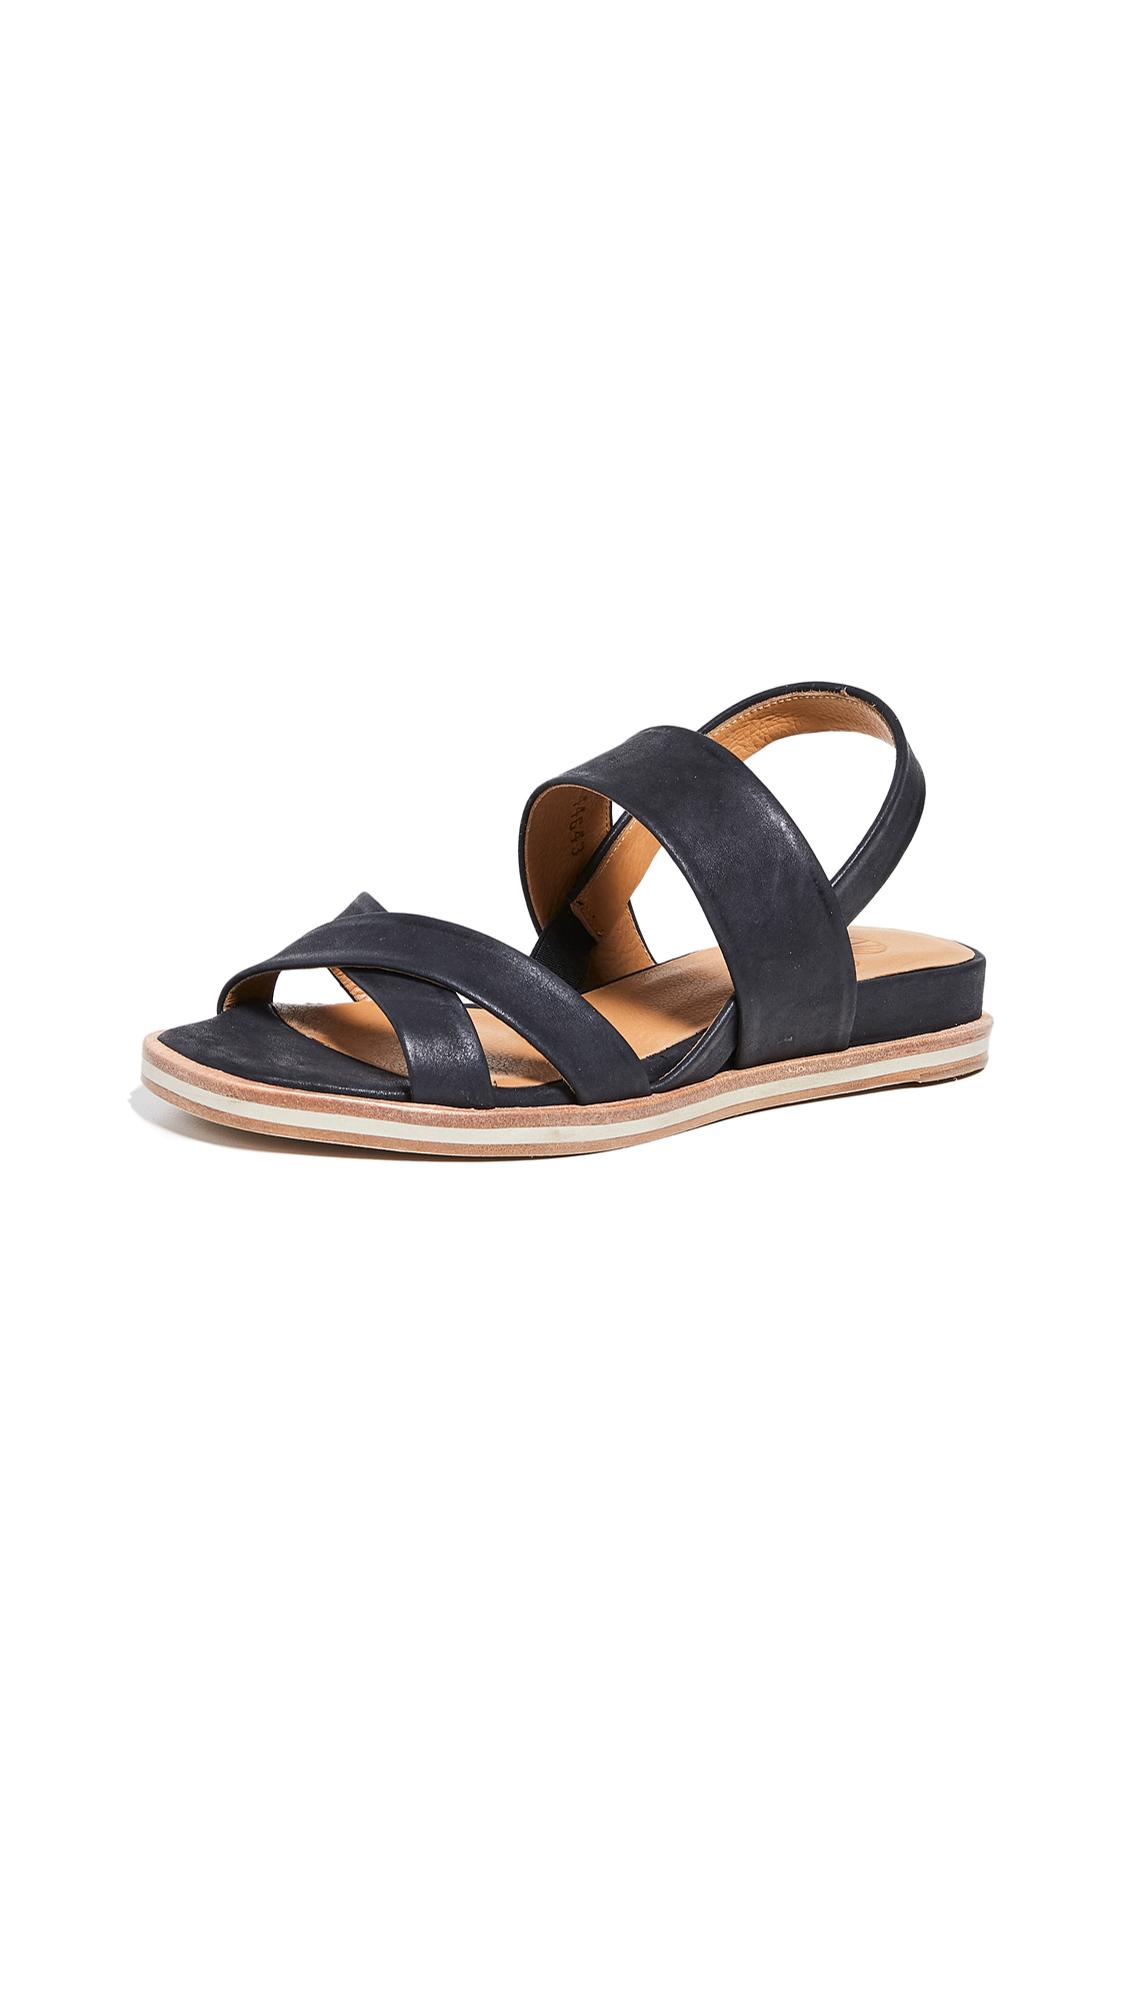 Coclico Shoes Katrin Strappy Sandals - Talco Black